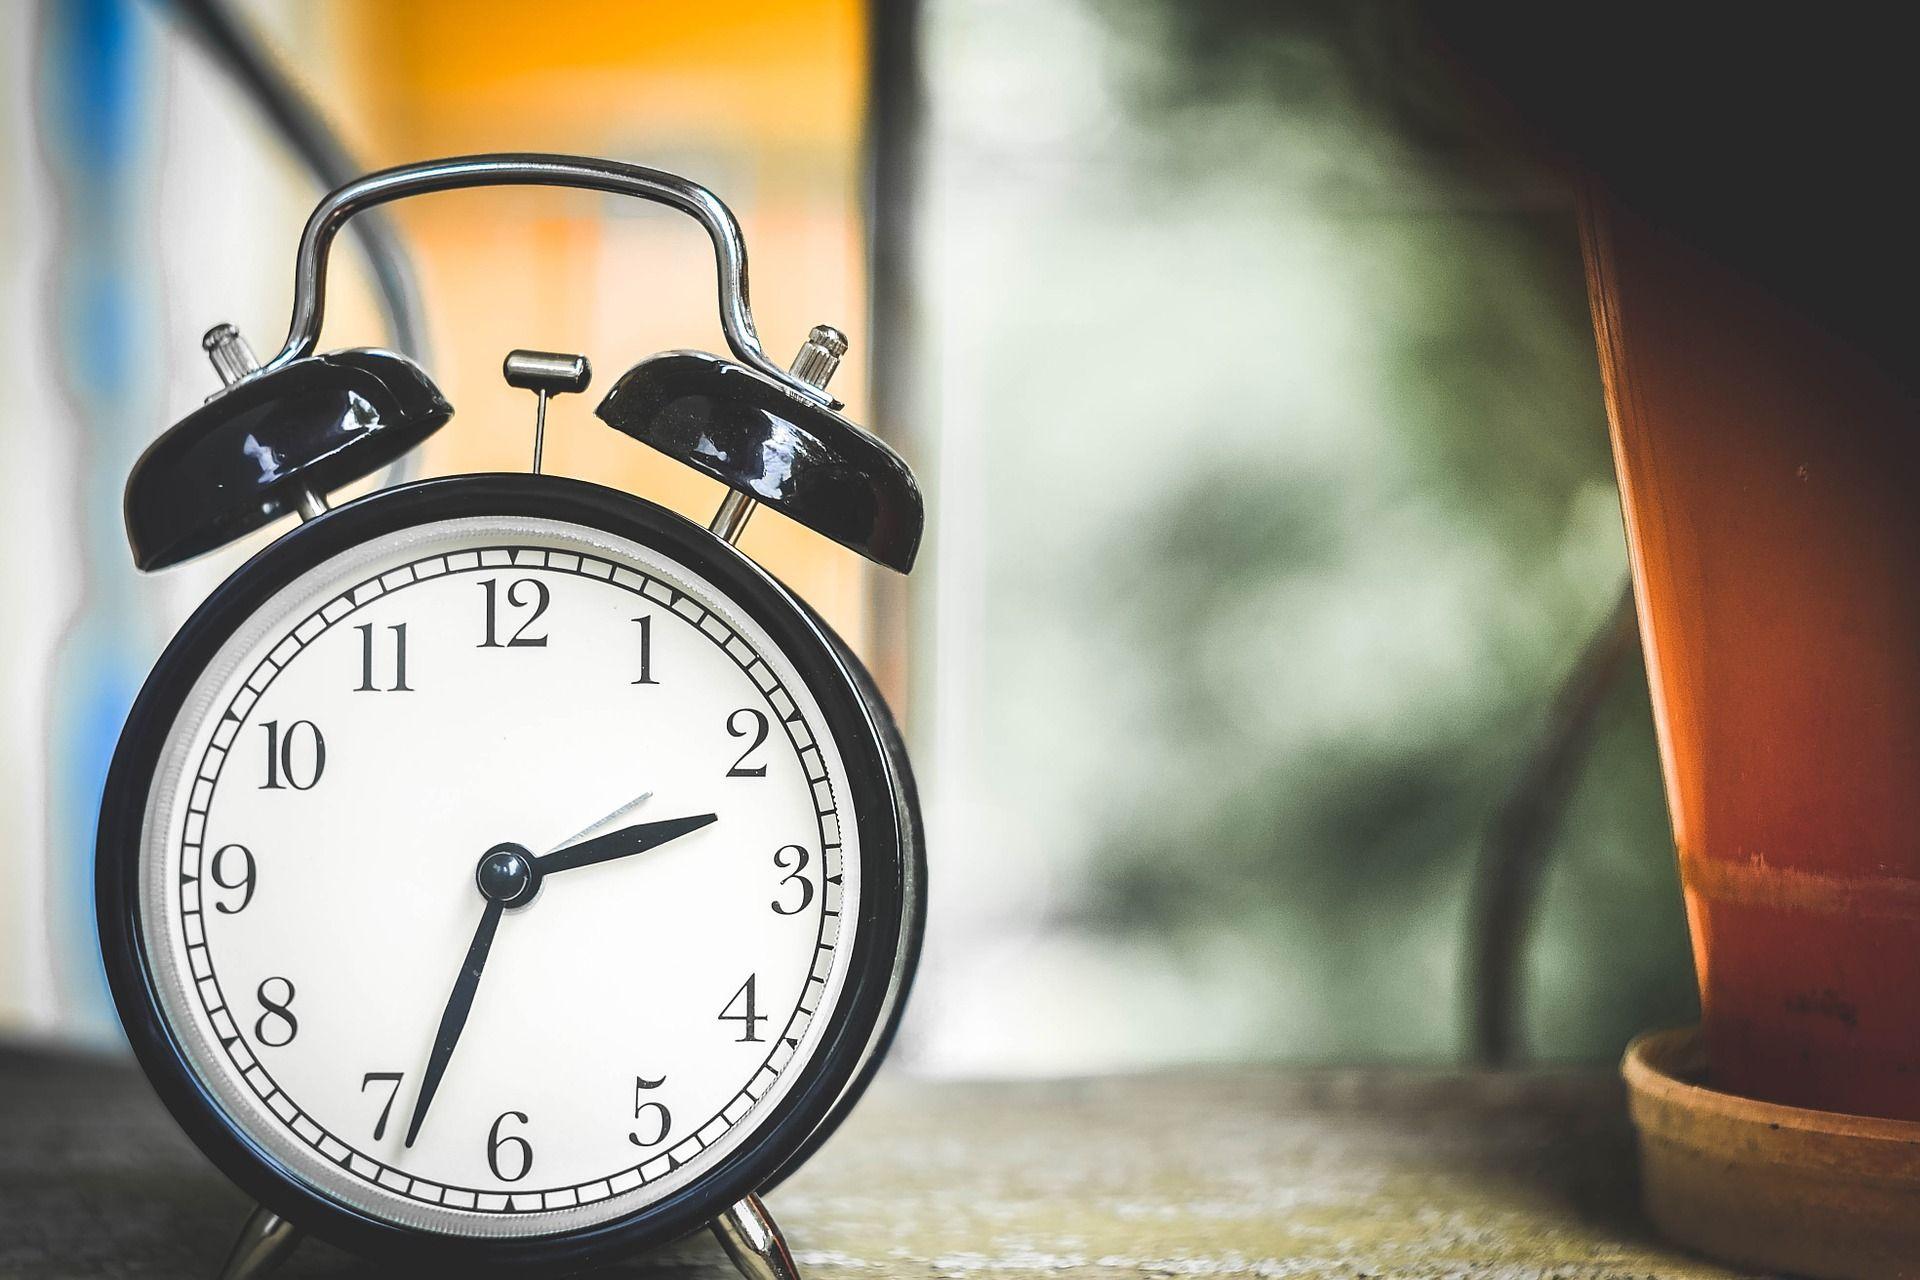 10_11_Daylight_Saving_Time